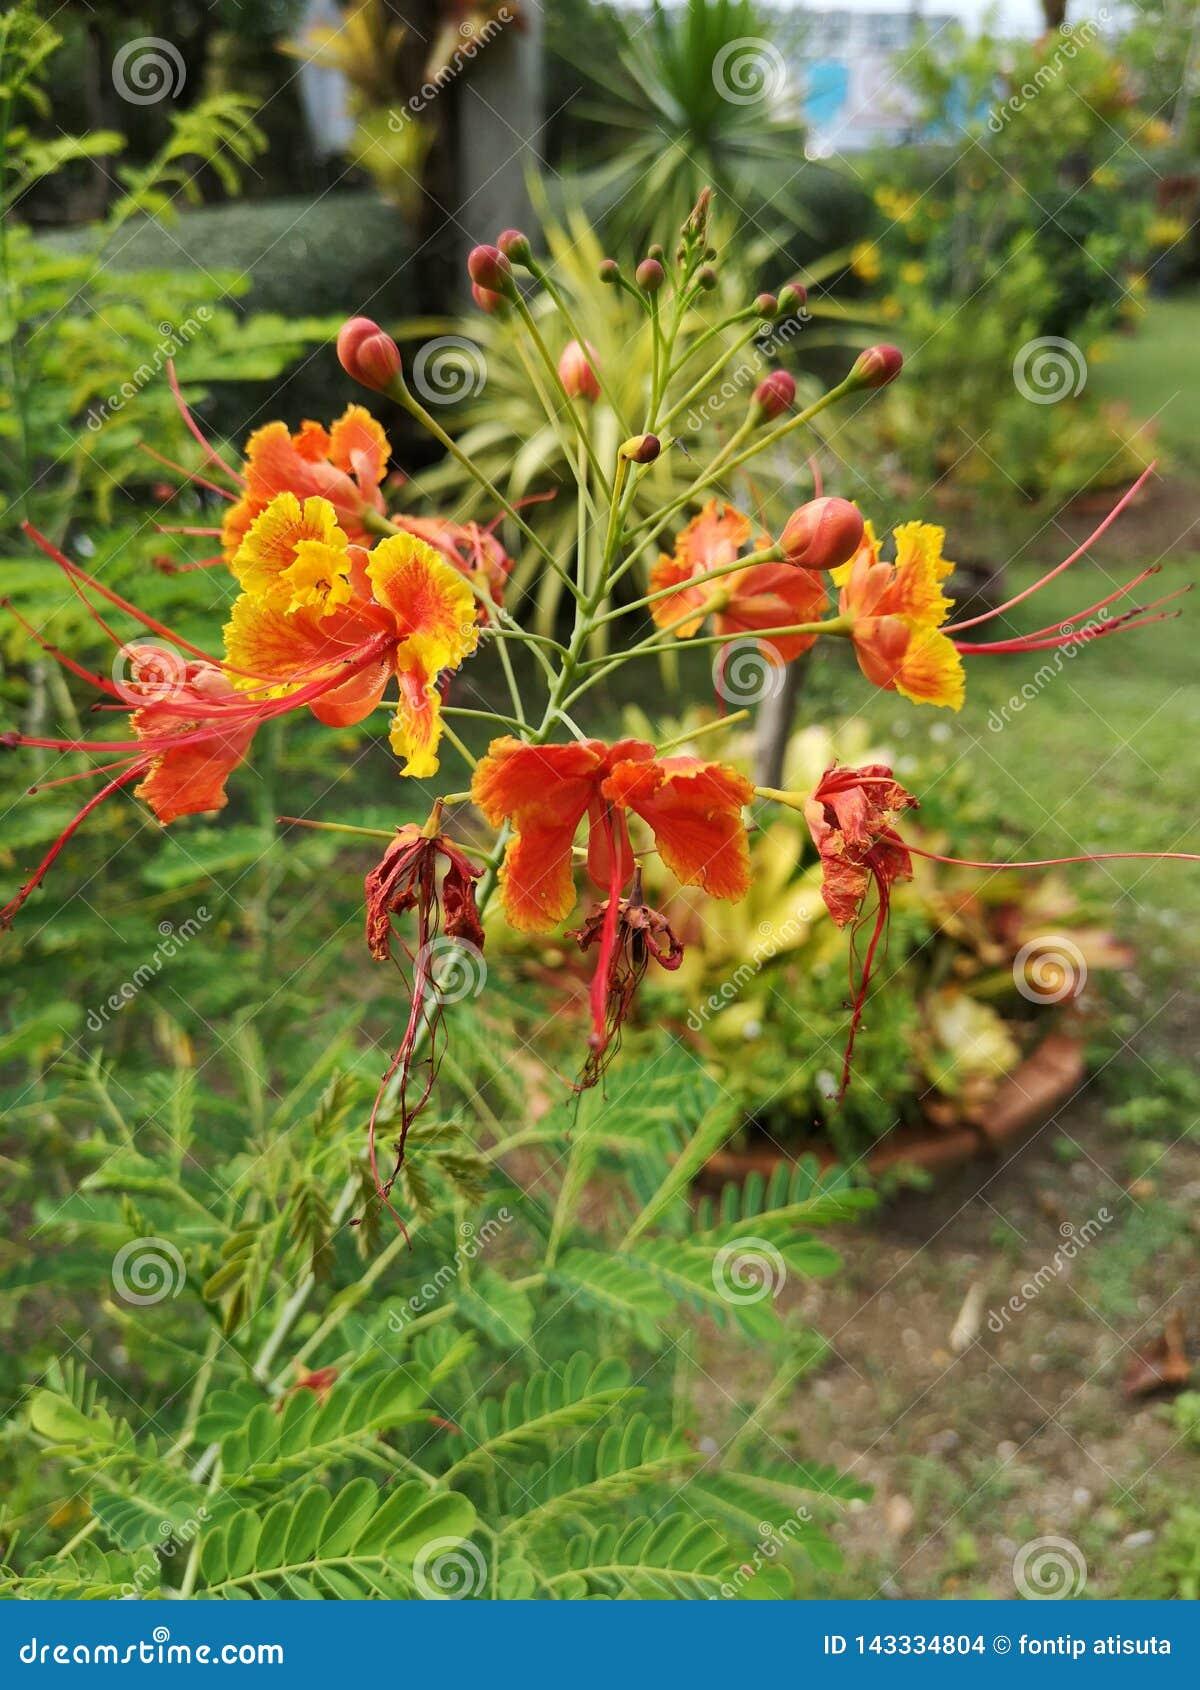 Flam-boyant, дерево пламени, королевское Poinciana